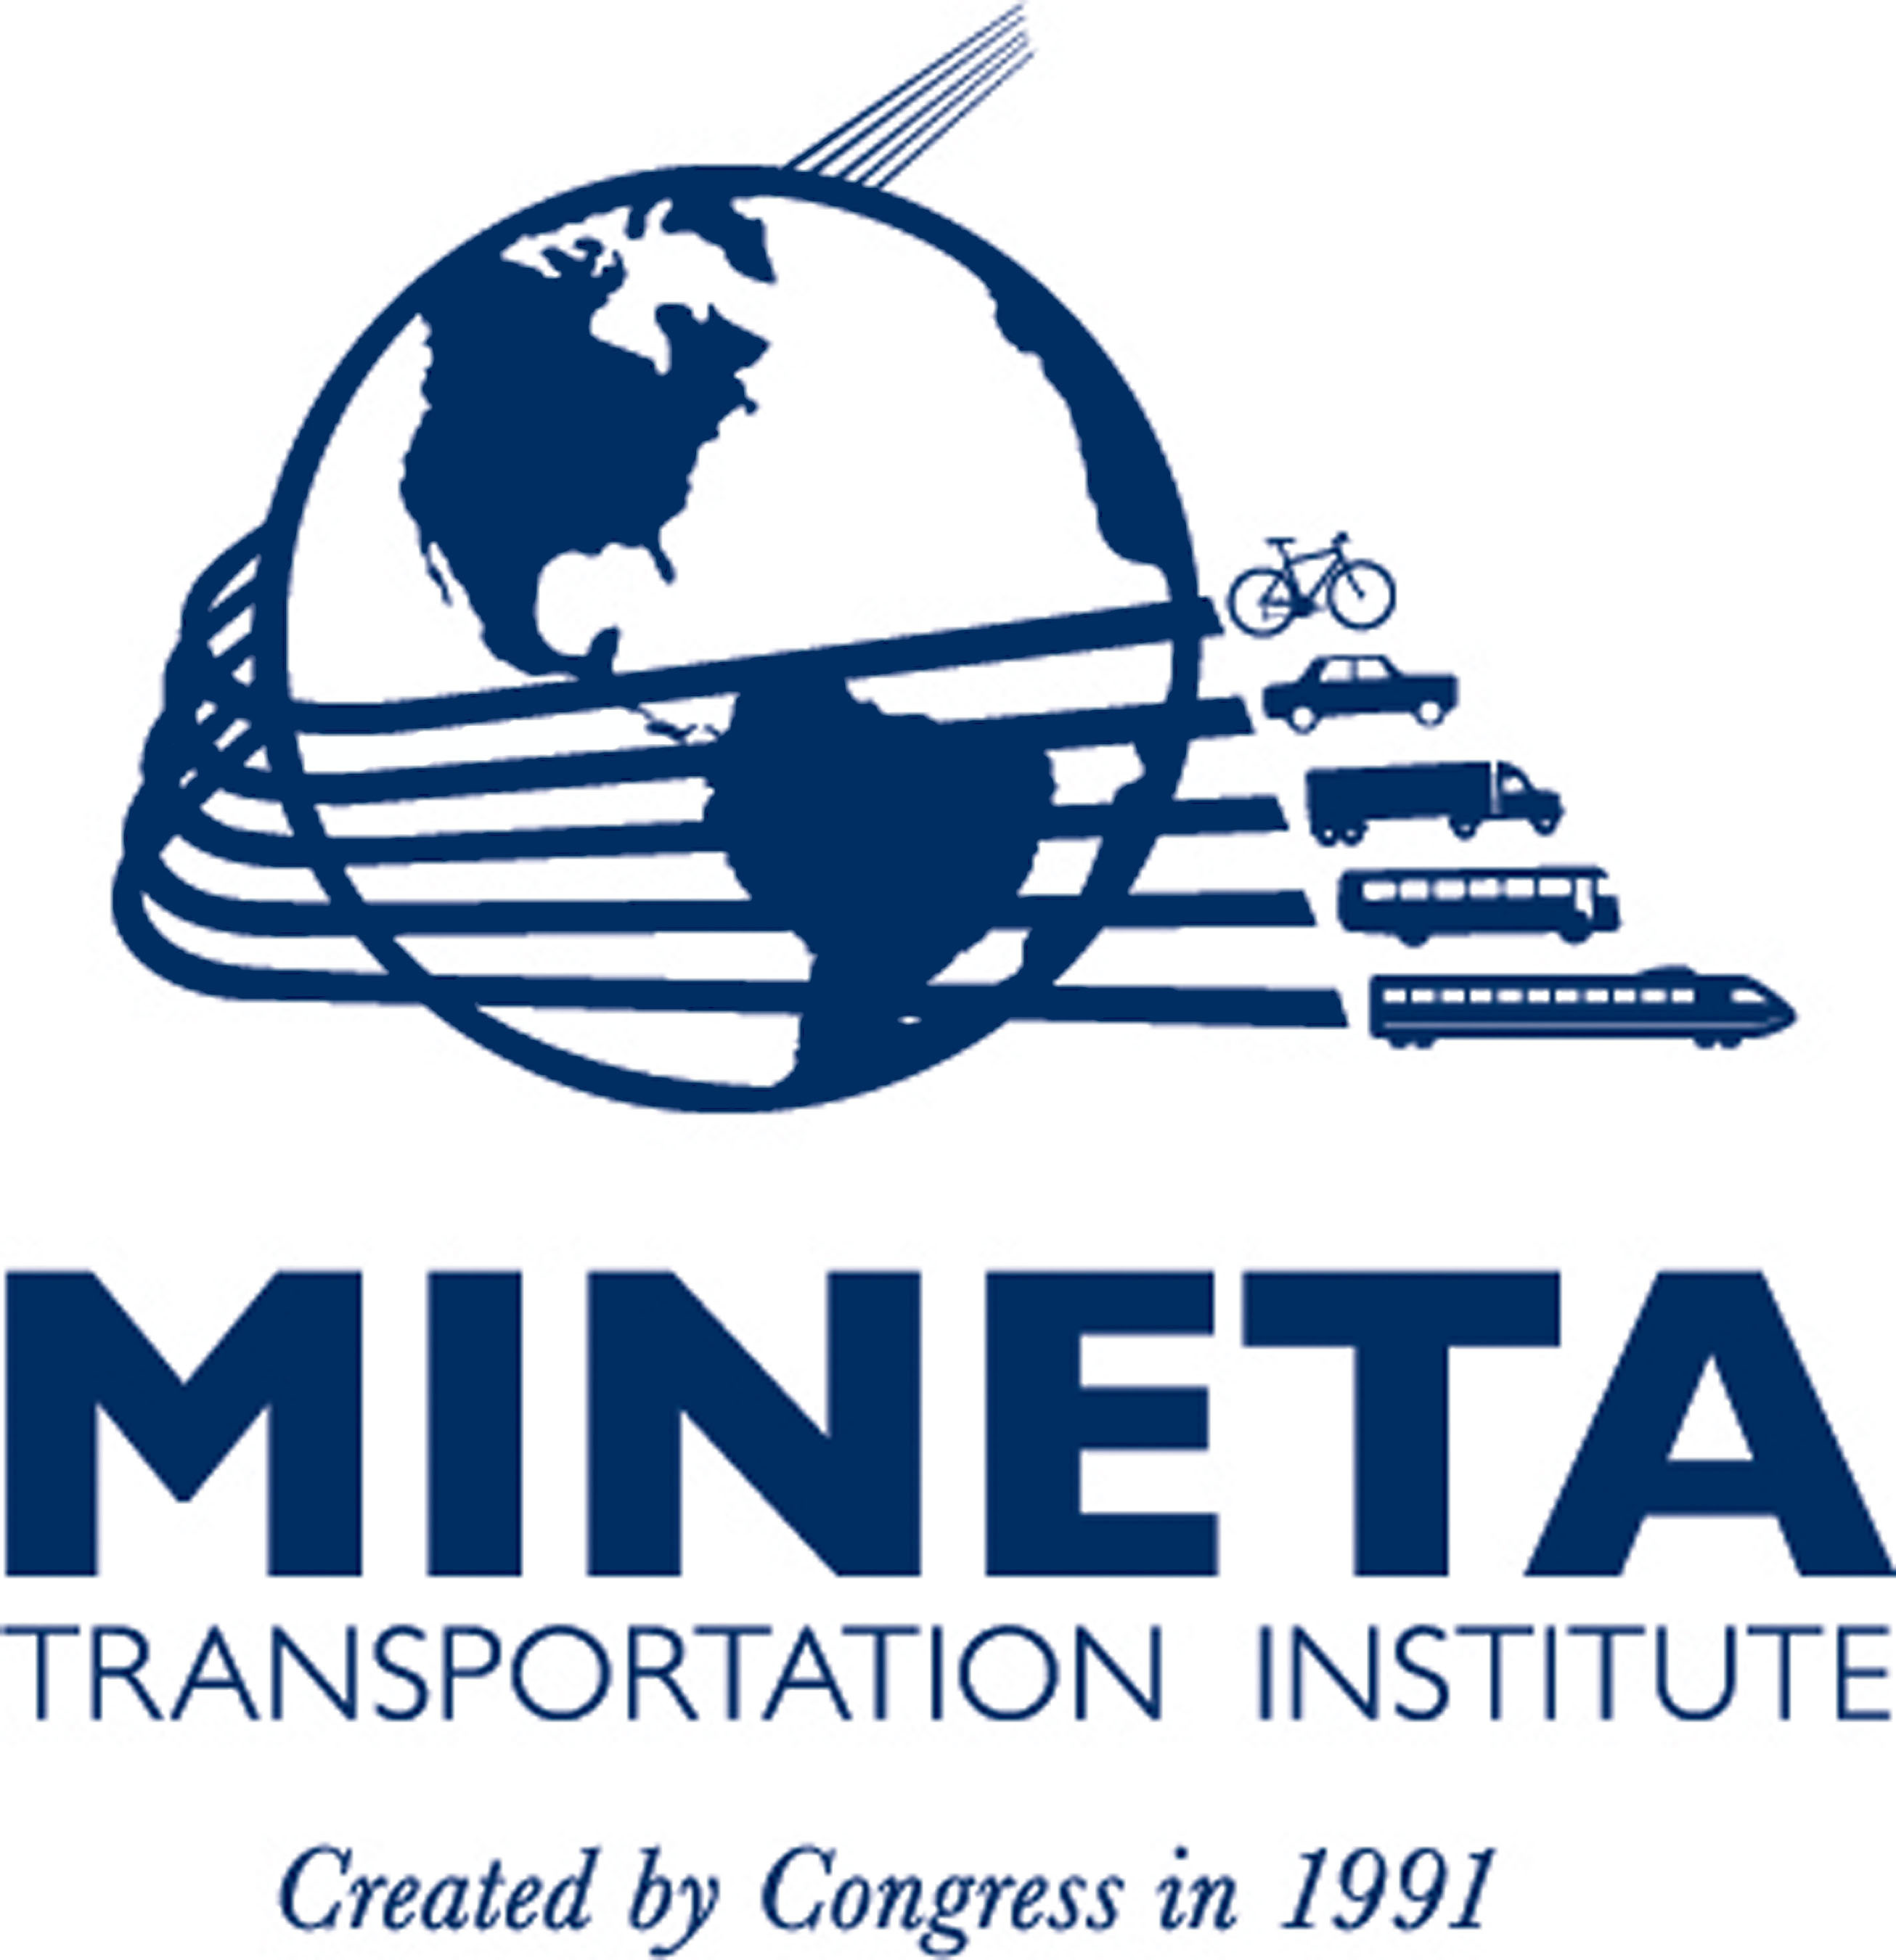 Mineta Transportation Institute.